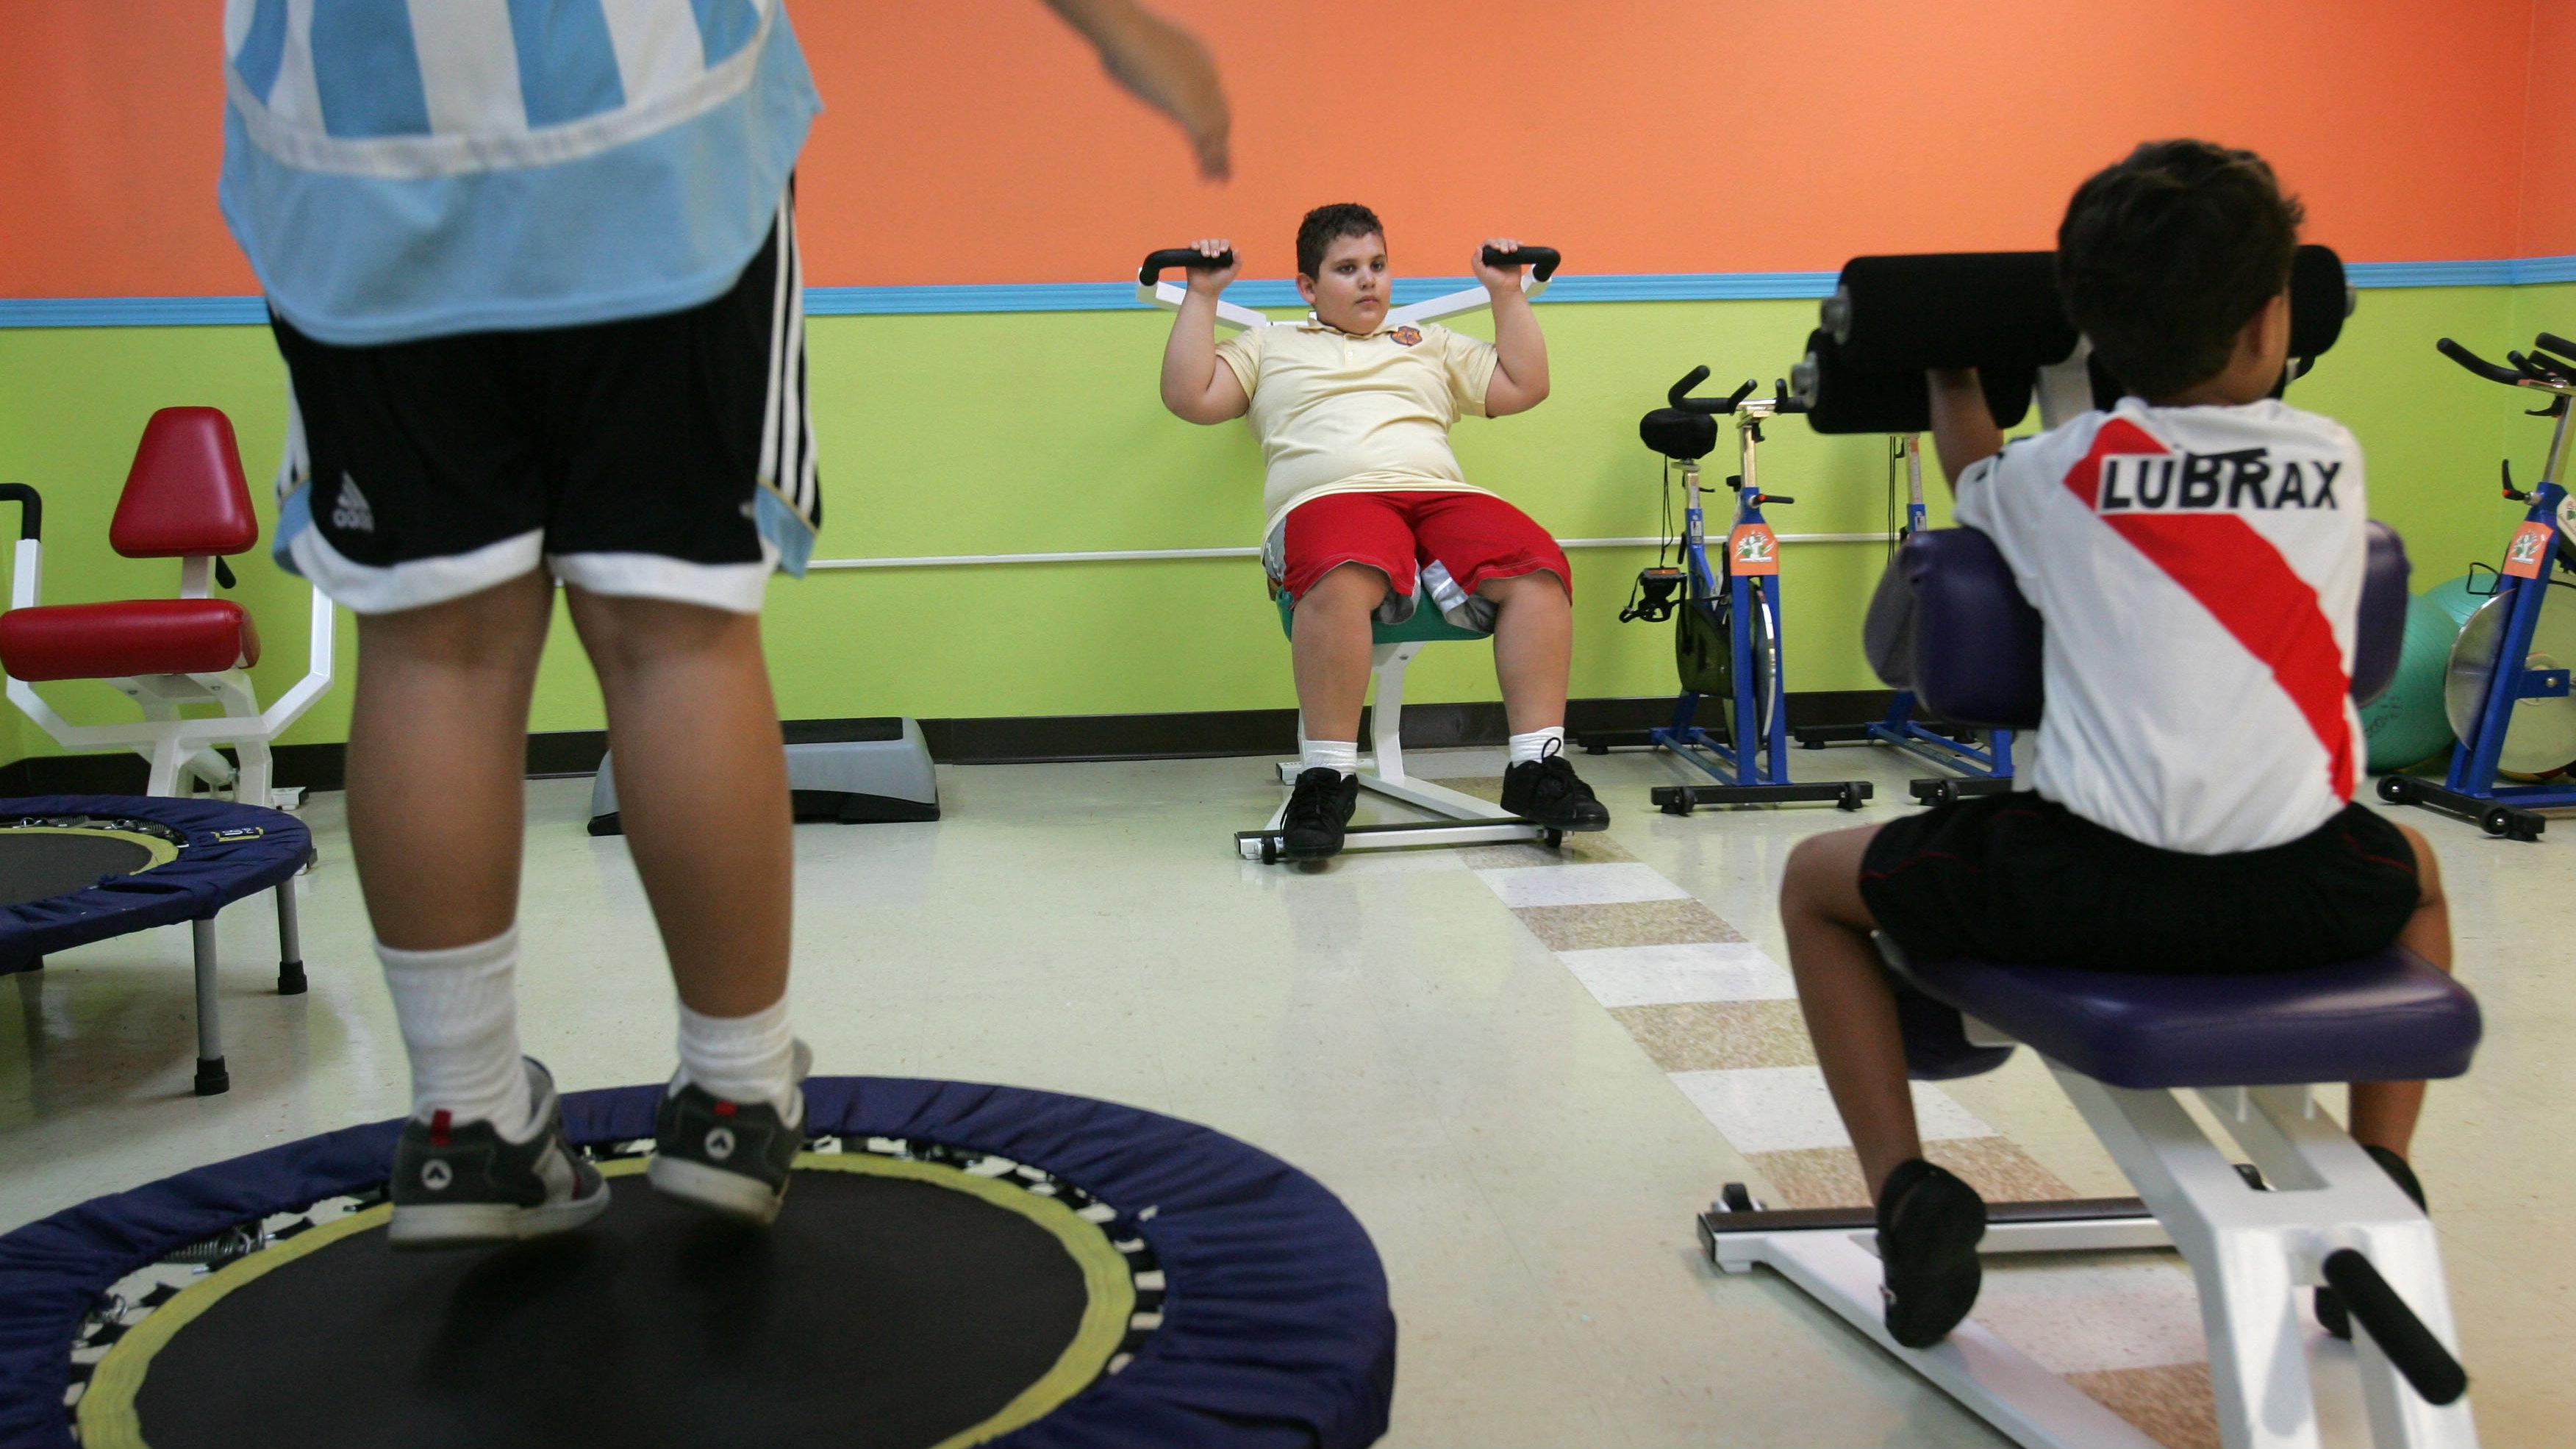 exercising boys in puerto rico